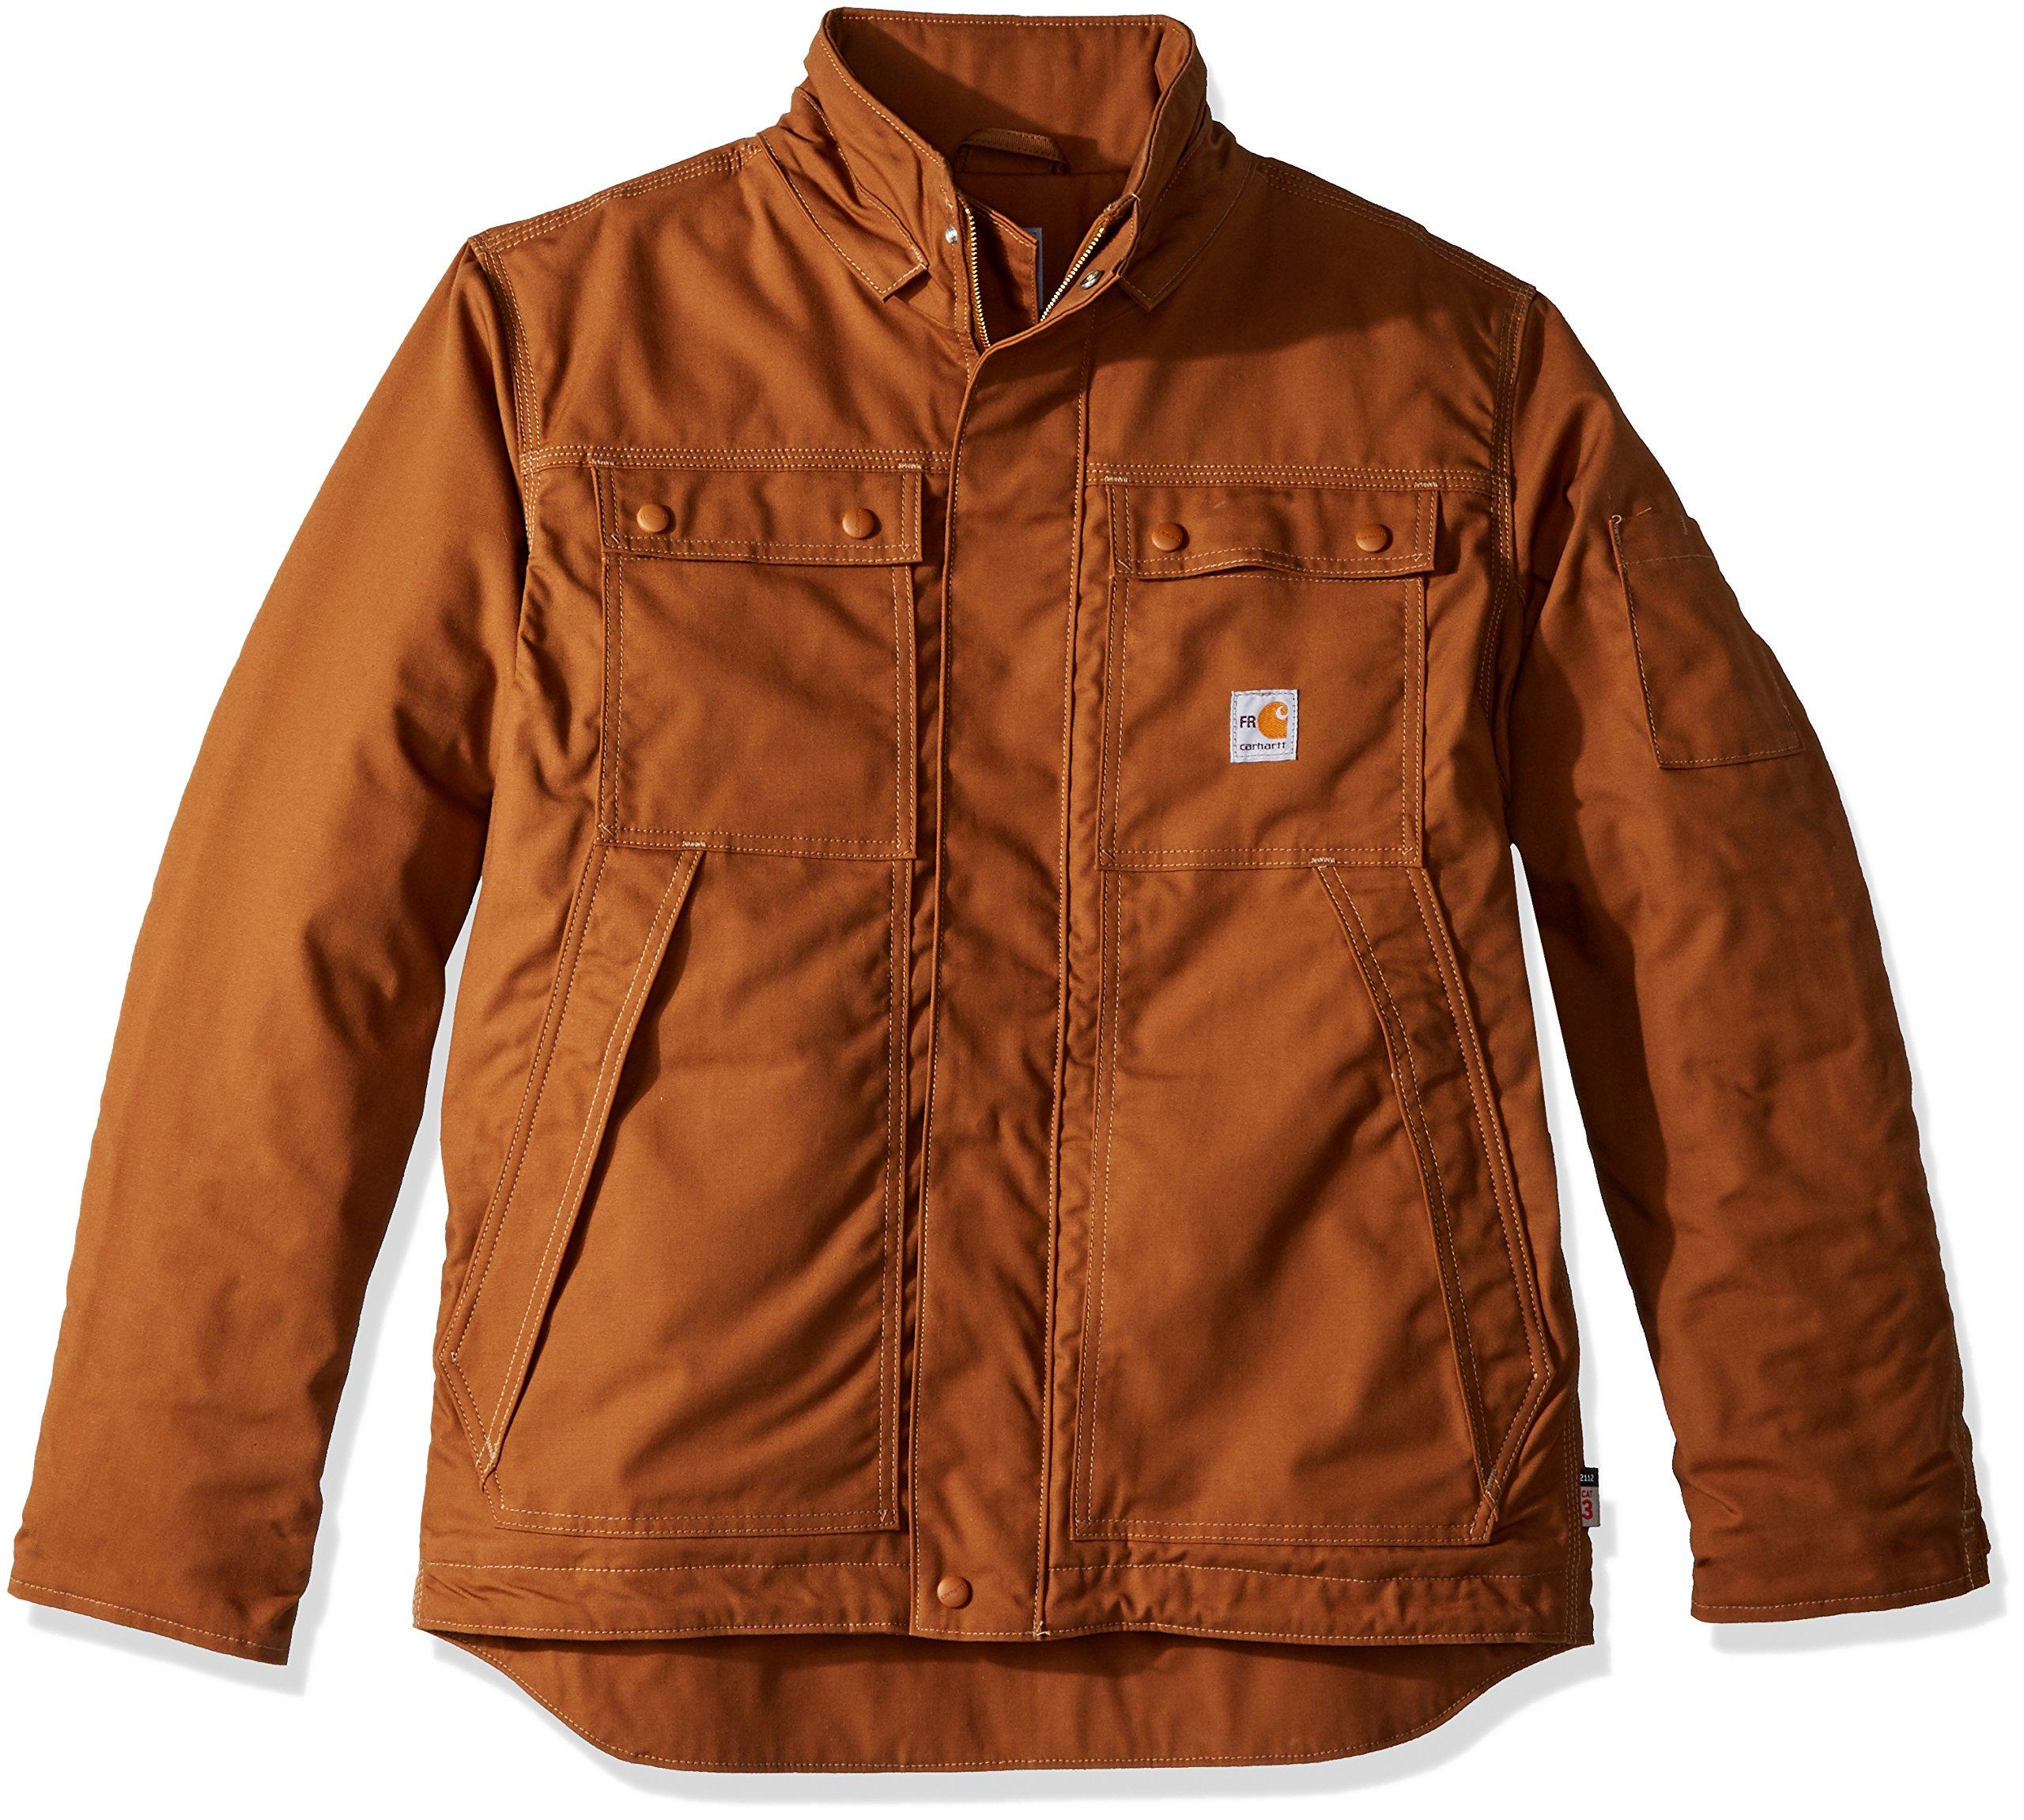 Carhartt Men's Flame Resistant Full Swing Quick Duck Coat, Brown, 2X-Large by Carhartt